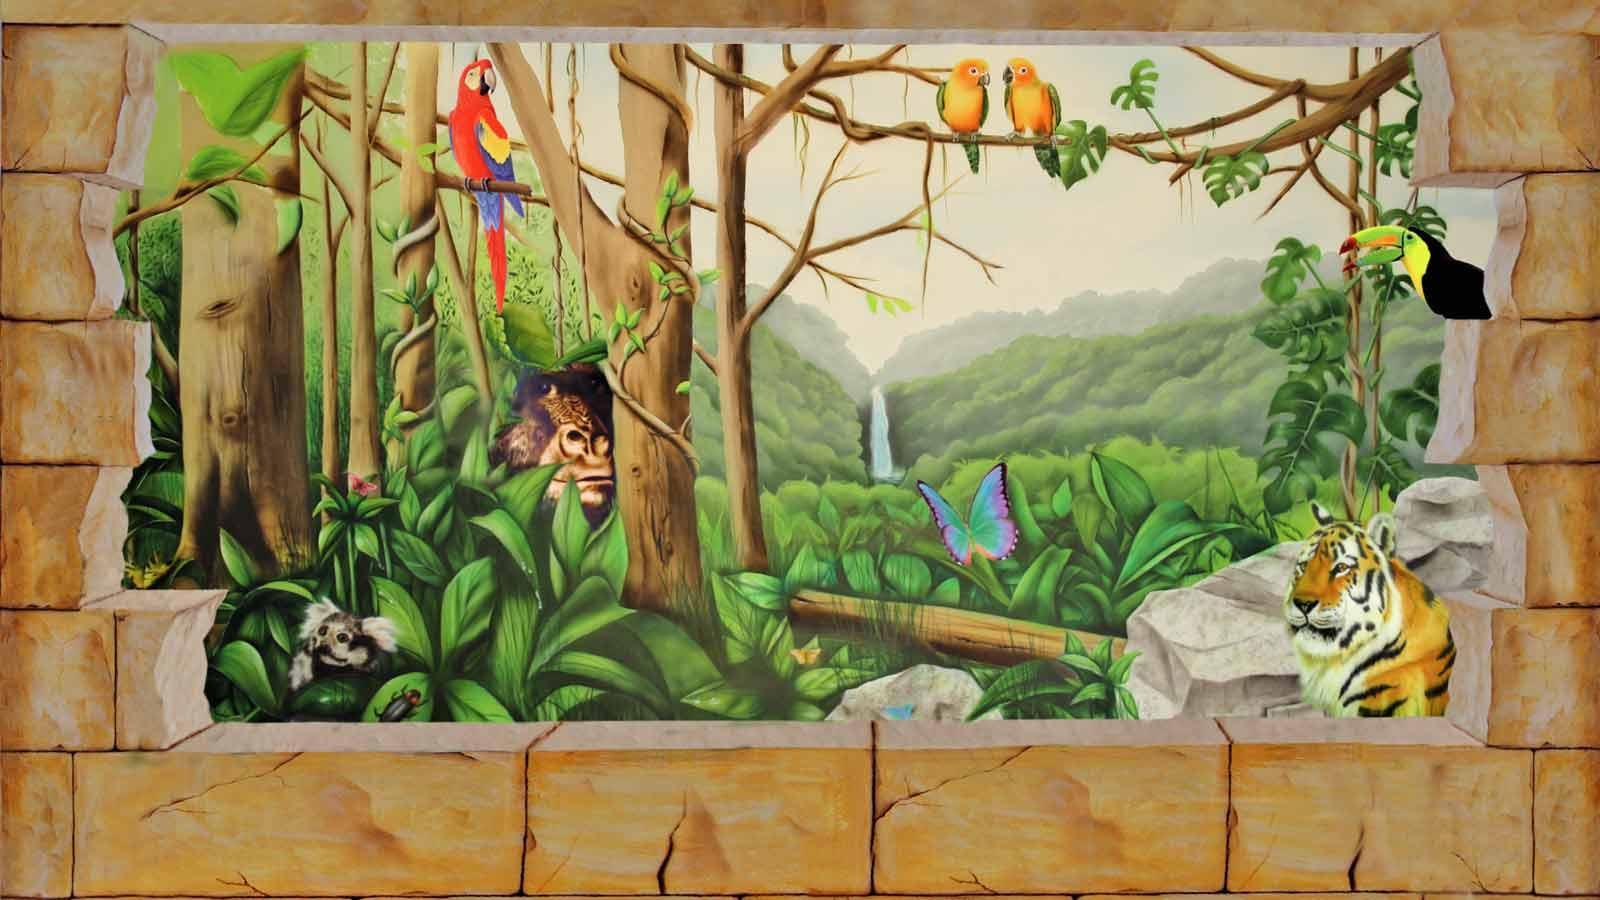 Wandmalerei Kinderzimmer | Wandmalerei Kinderzimmer Wandgestaltungkinderzimmer